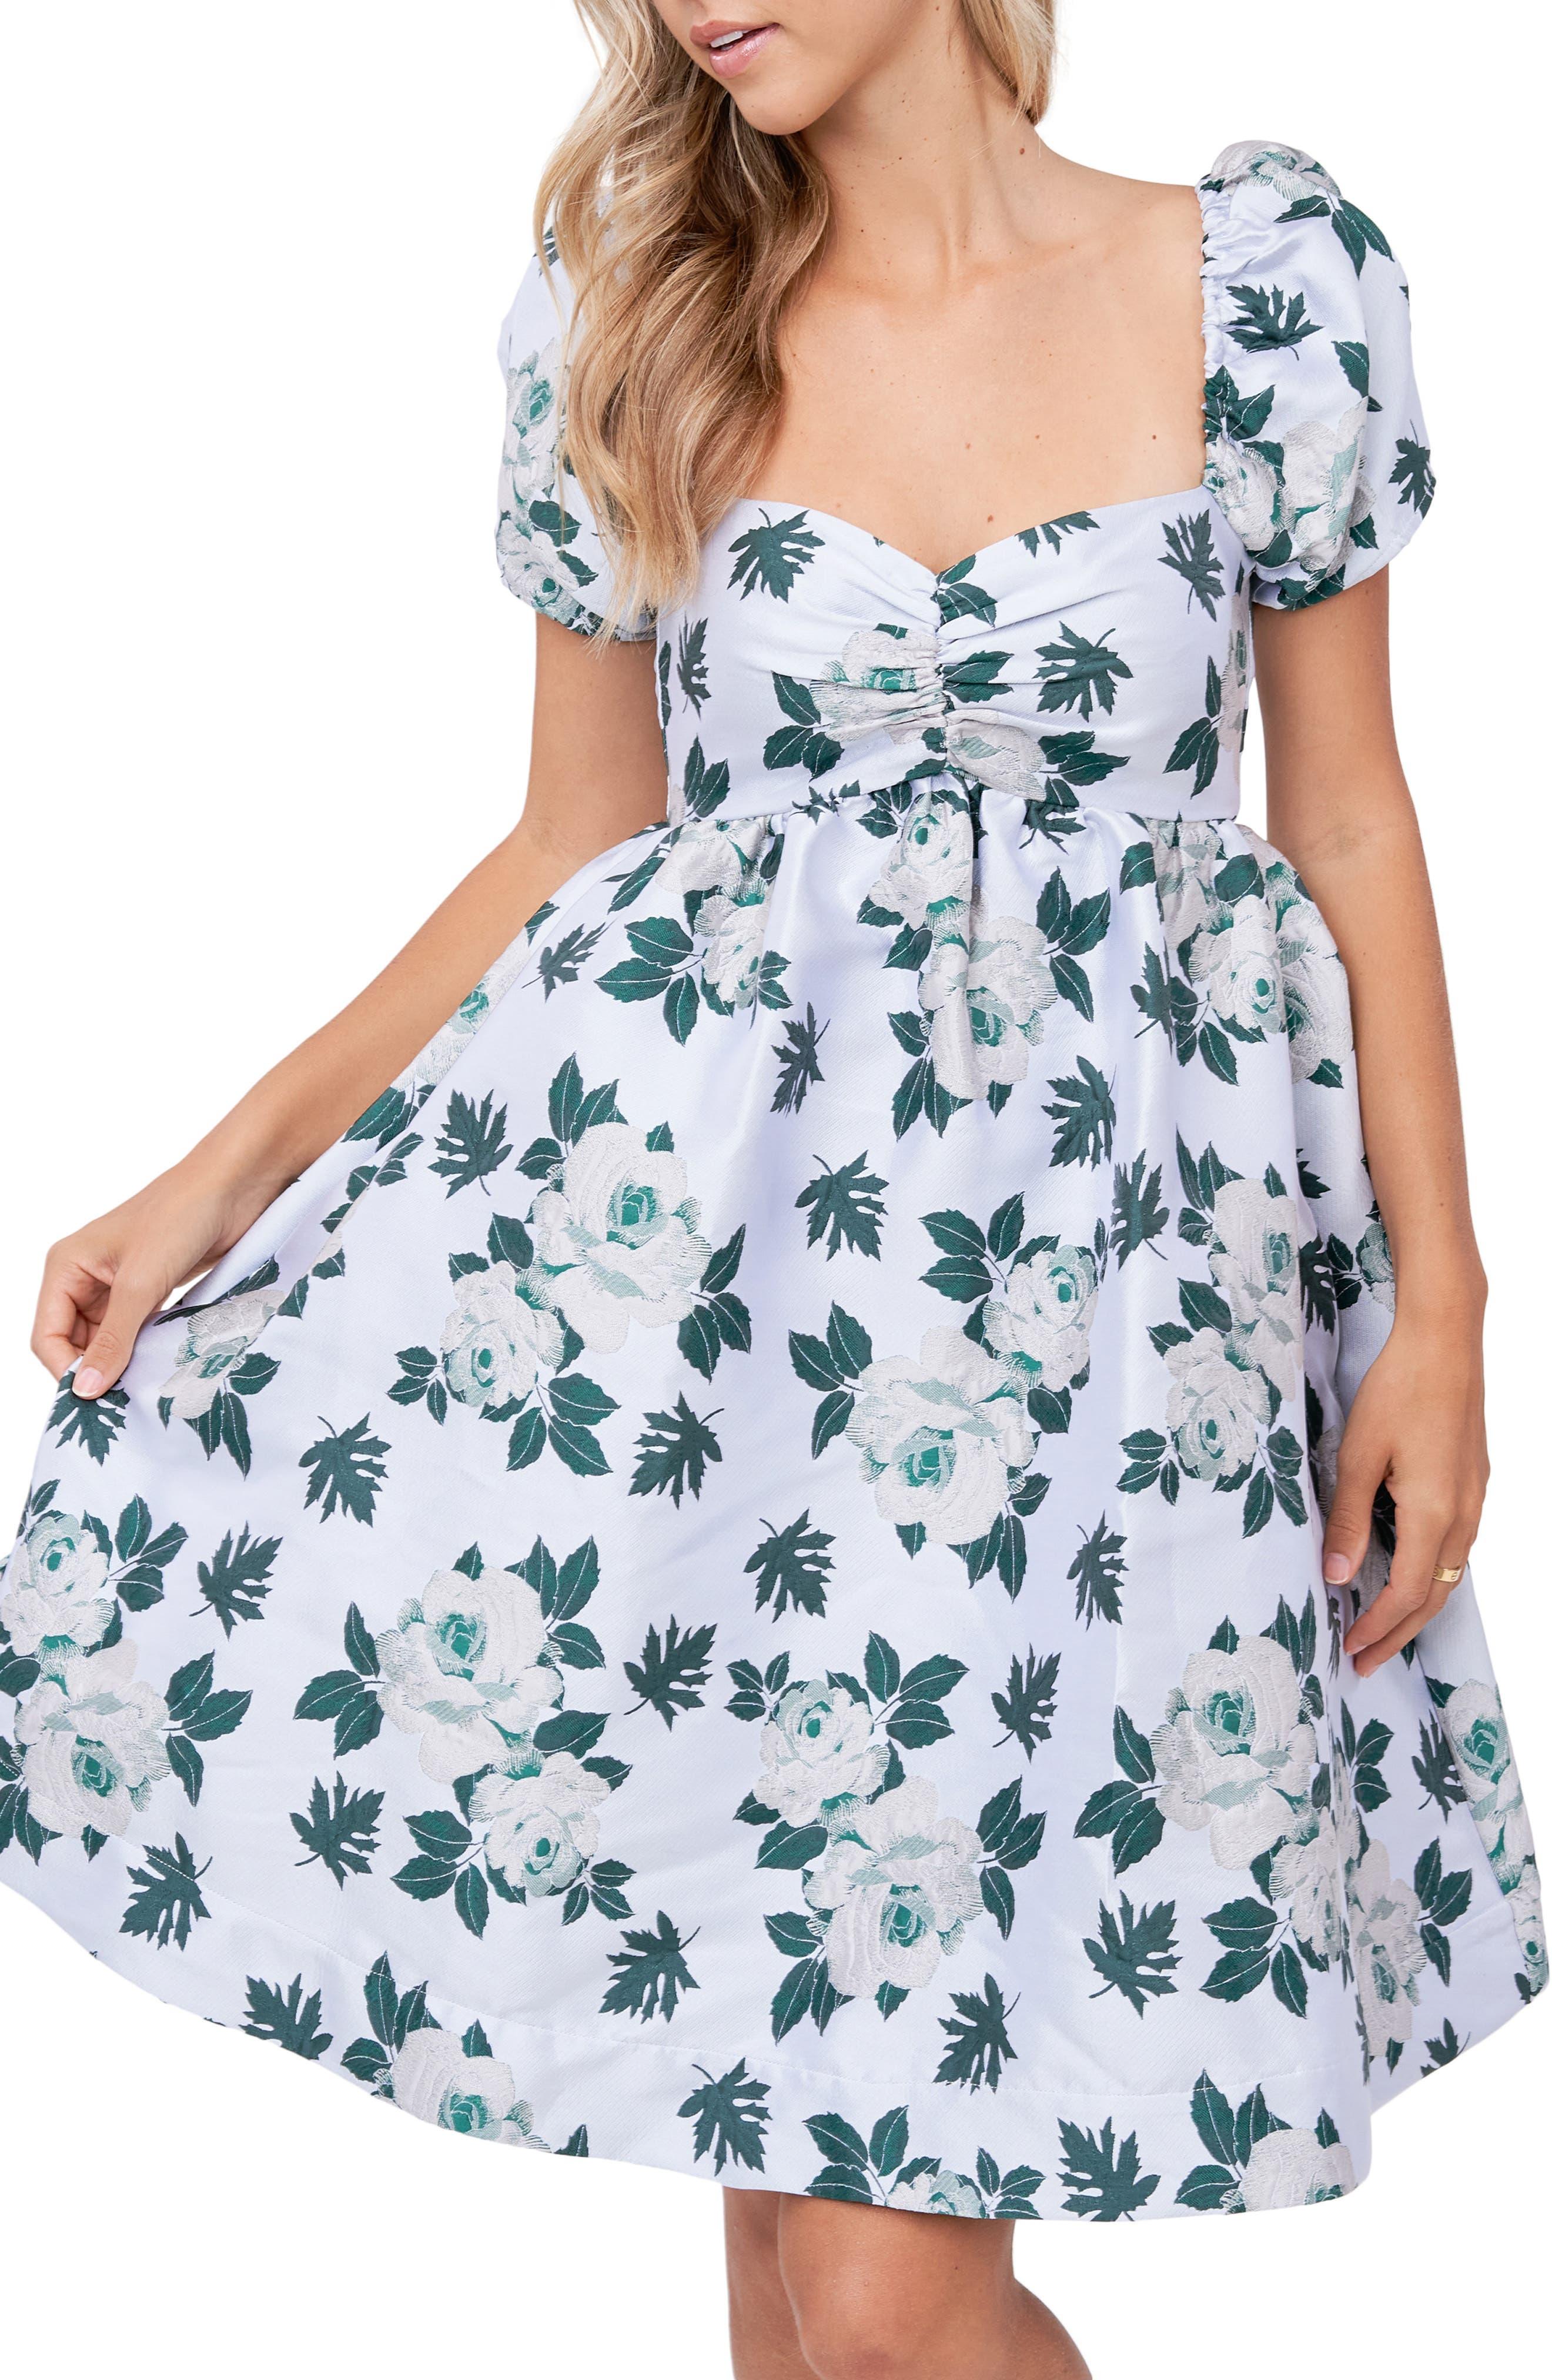 Floral Jacquard Babydoll Dress